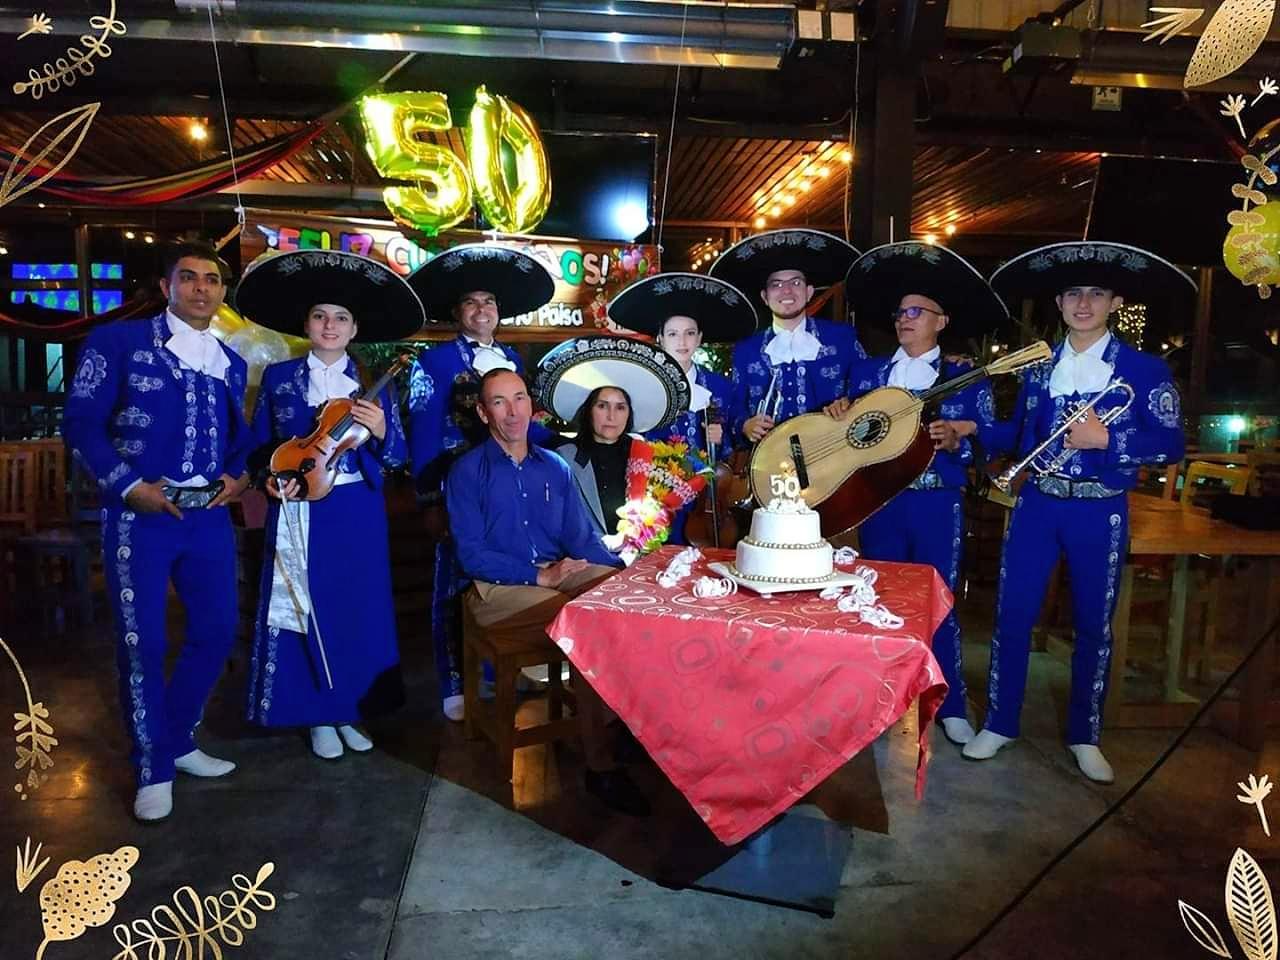 mariachis en itagui eclipse mexicano